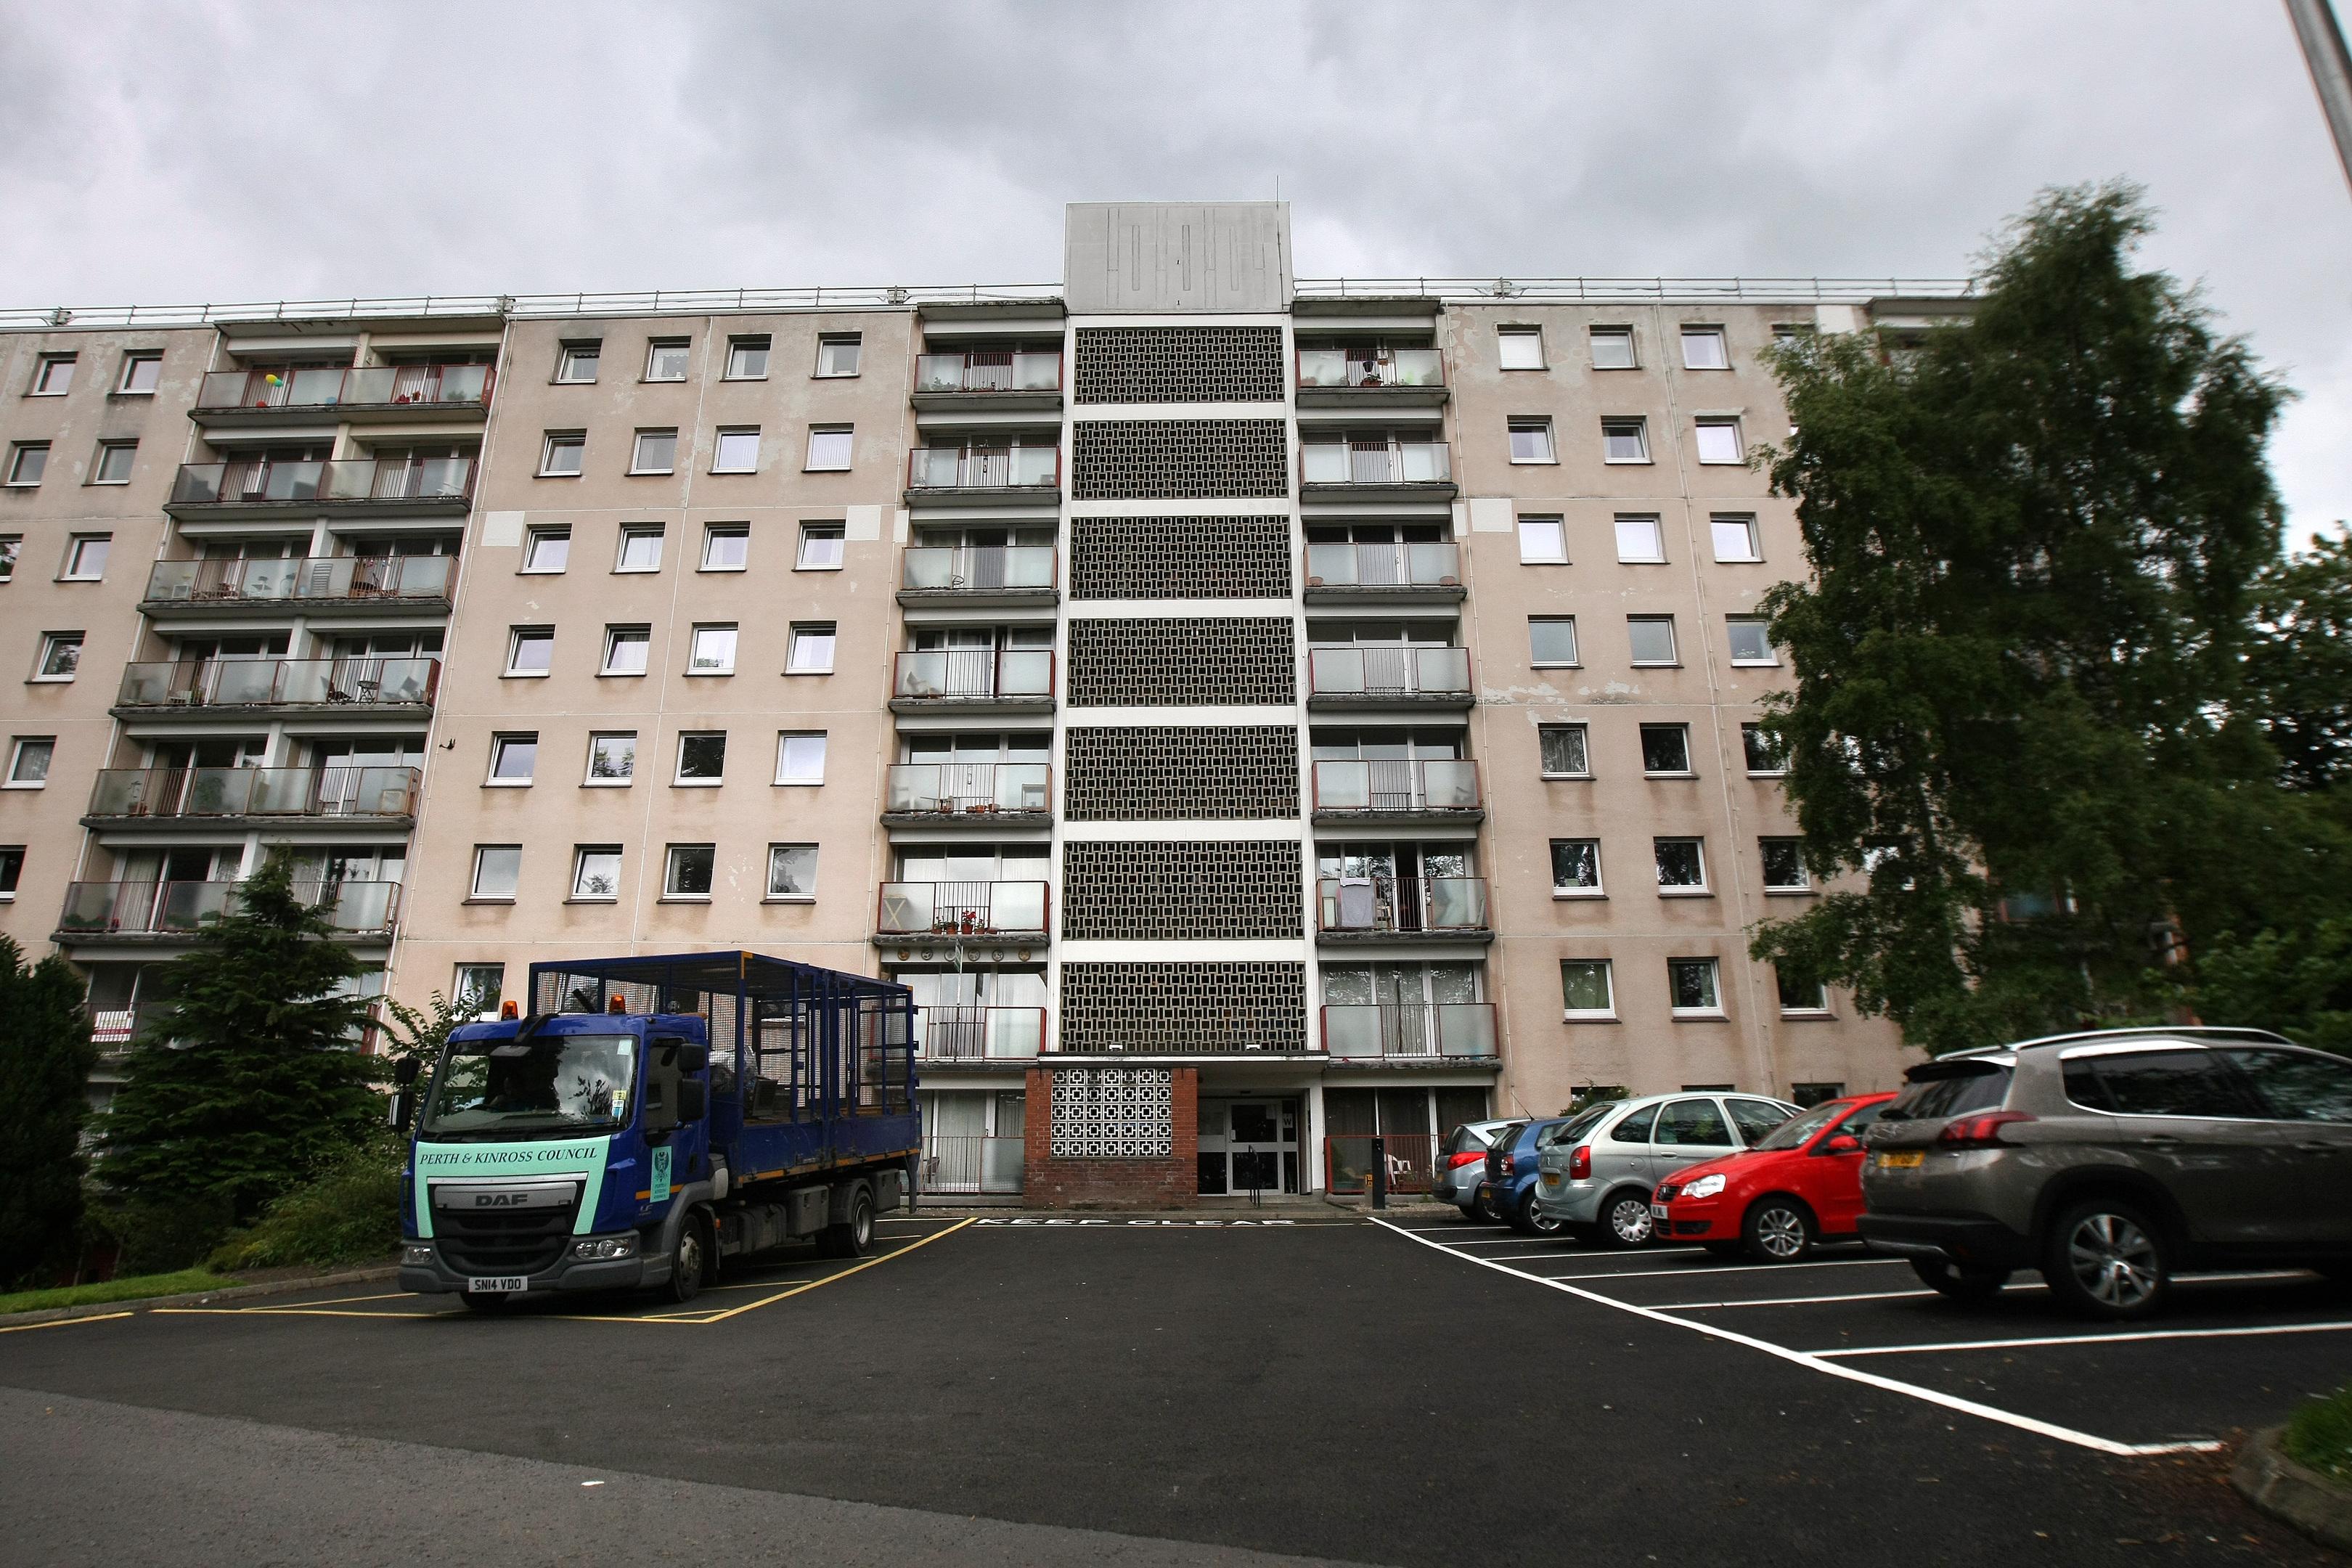 High rise flats in Potterhill.